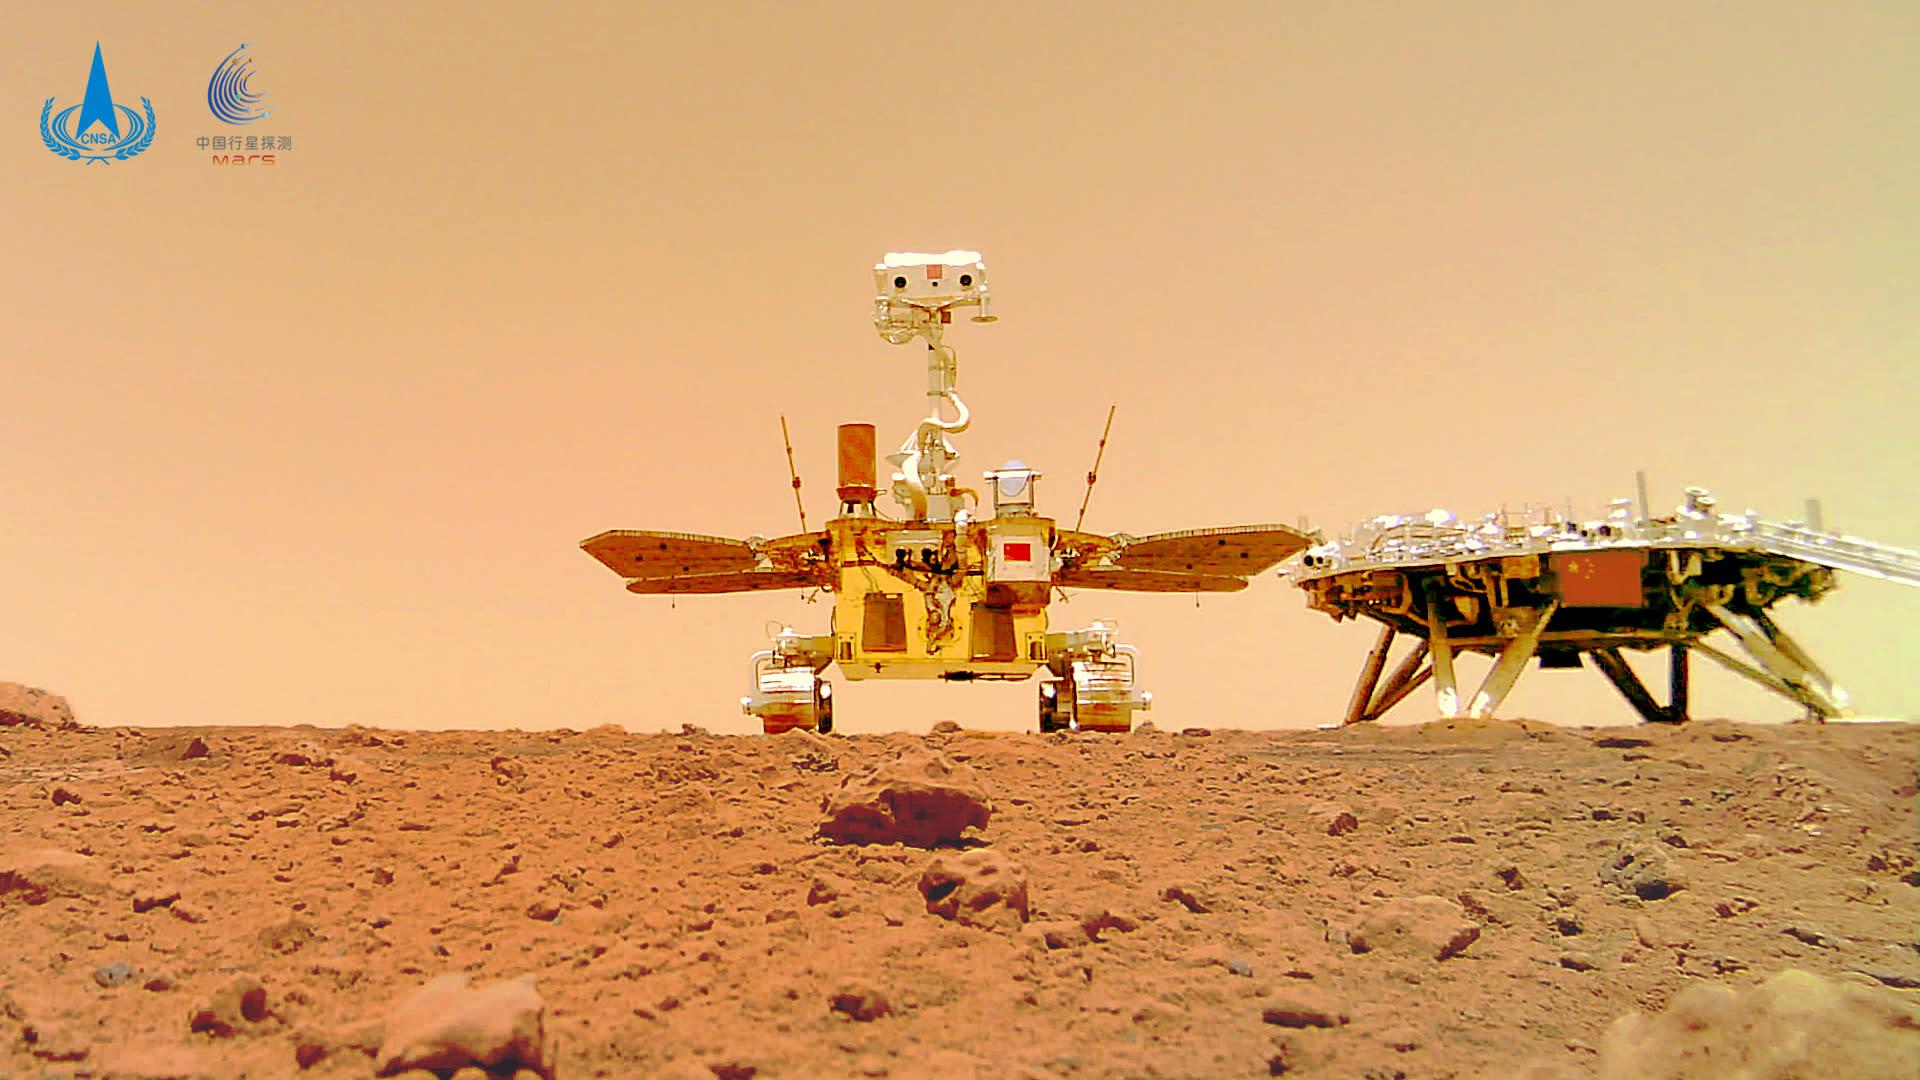 China Zhurong Mars rover selfie